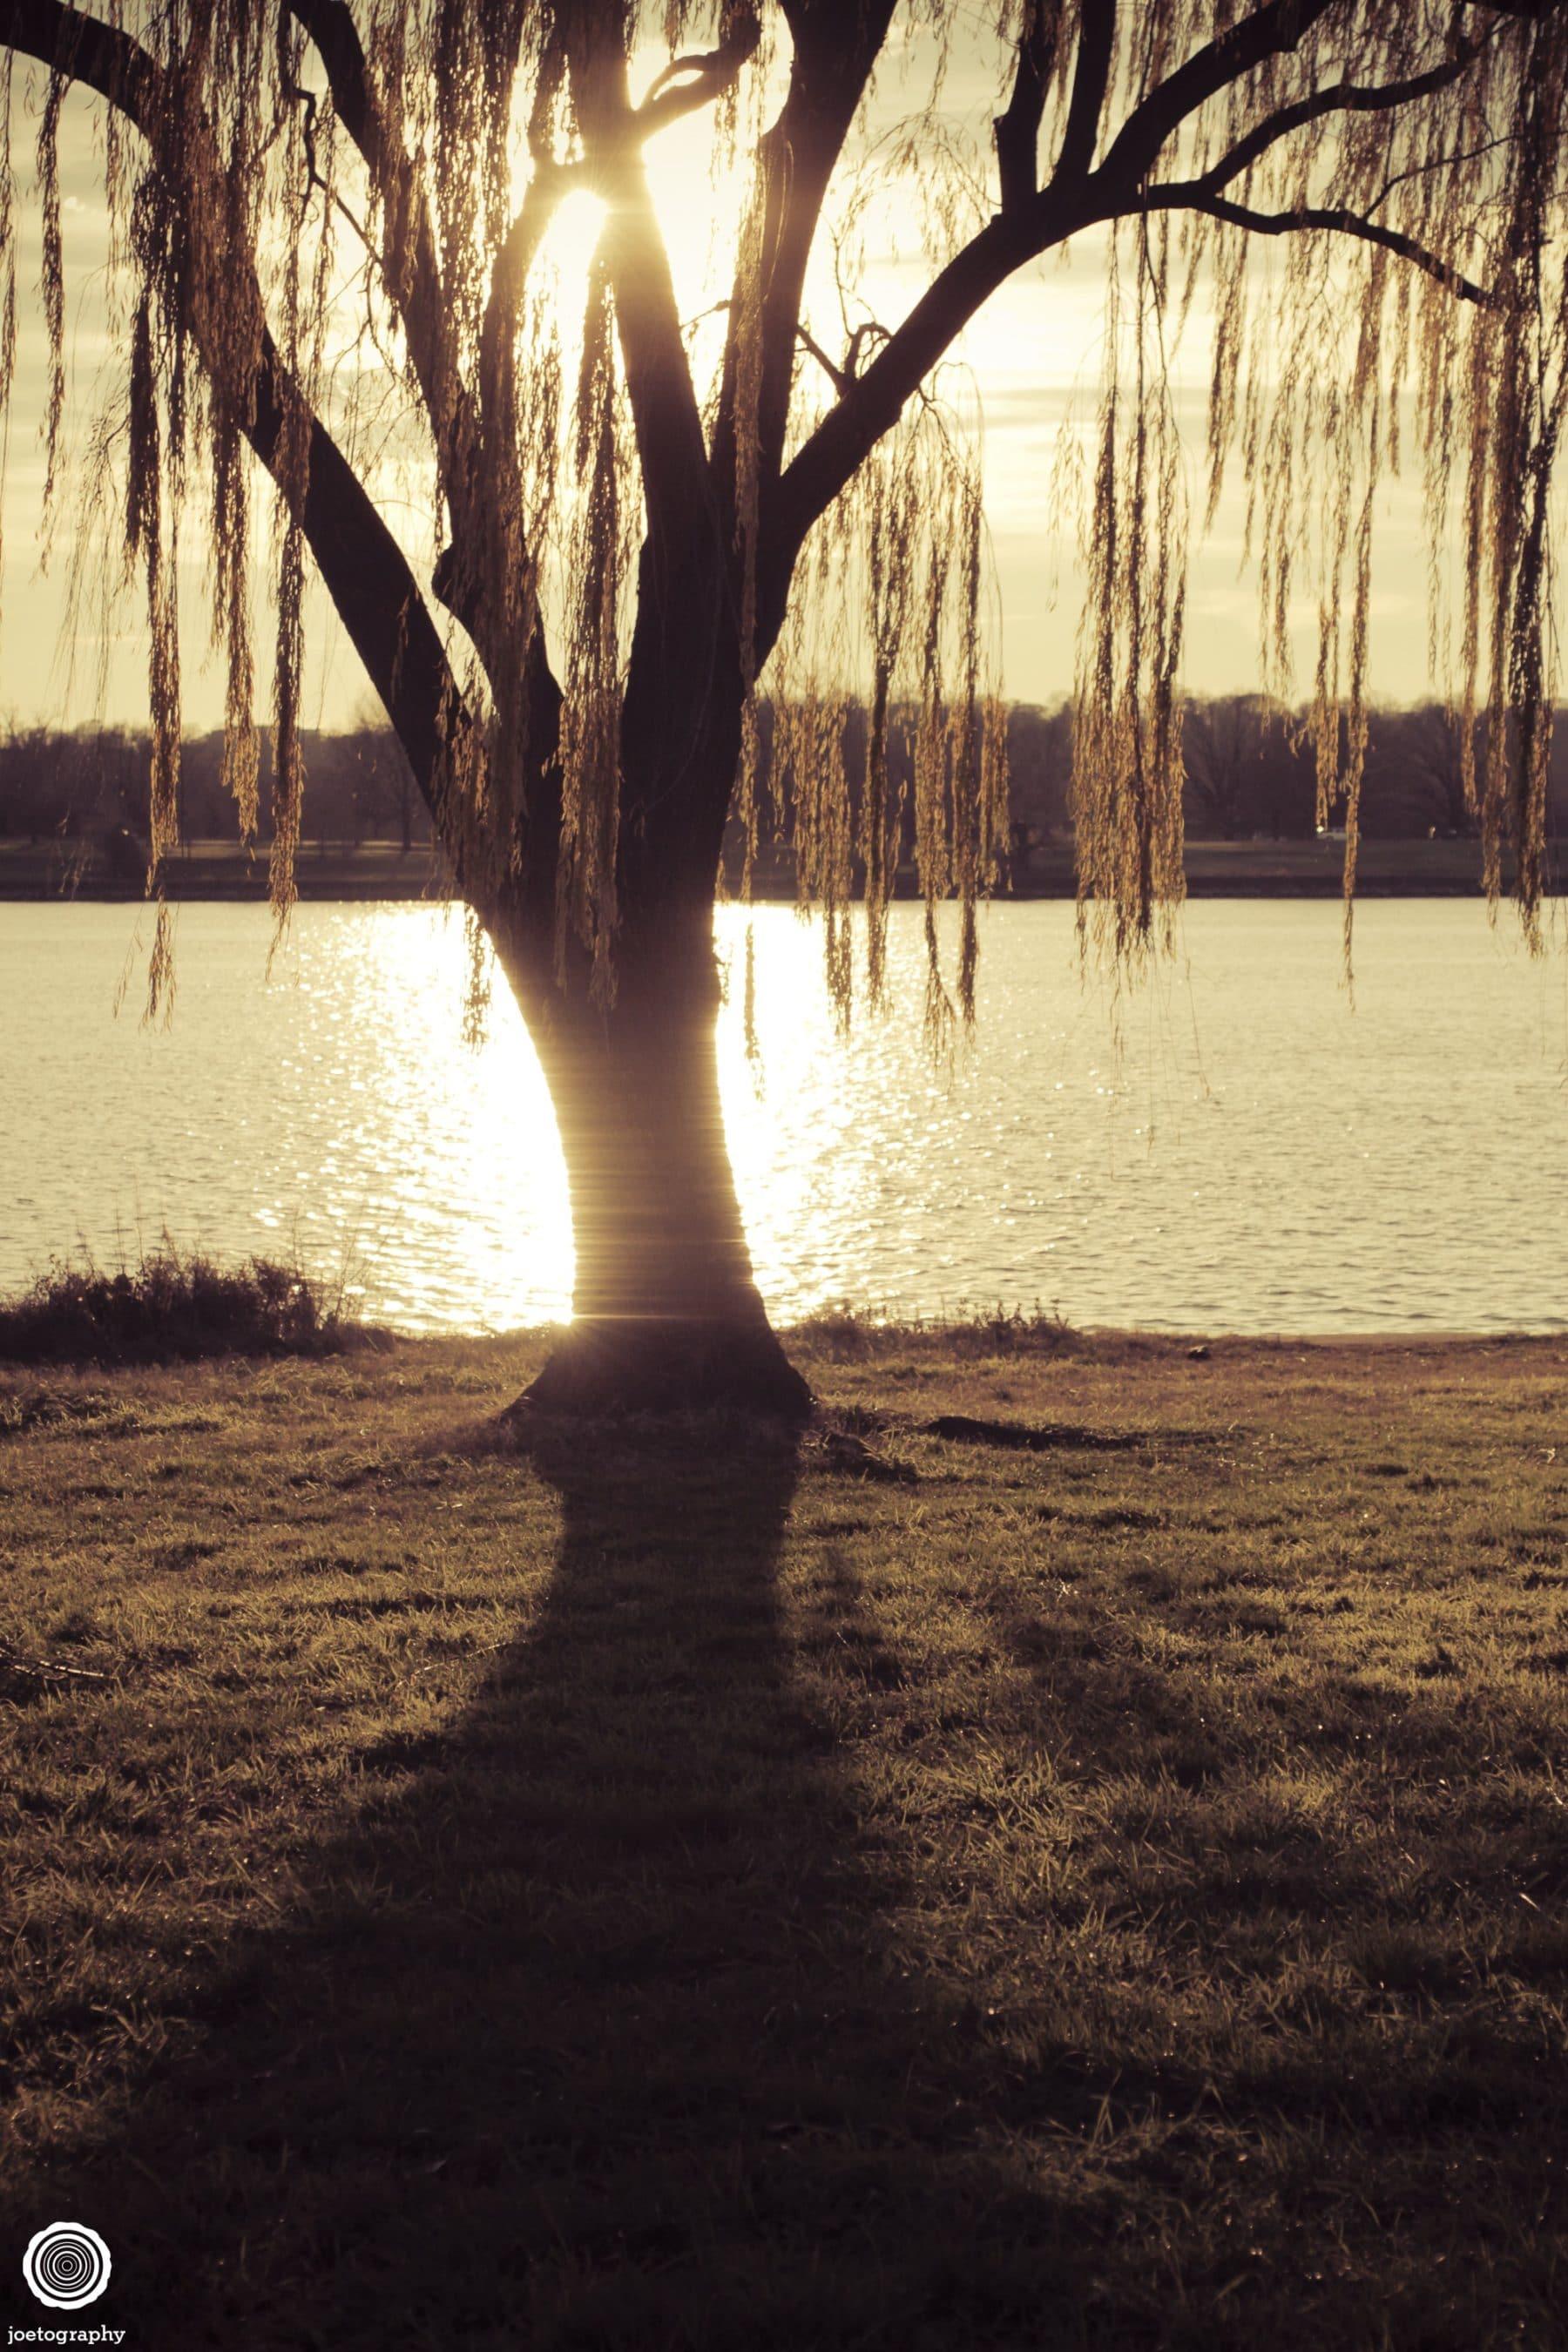 weeping-willow-nature-photography-washington-dc-3